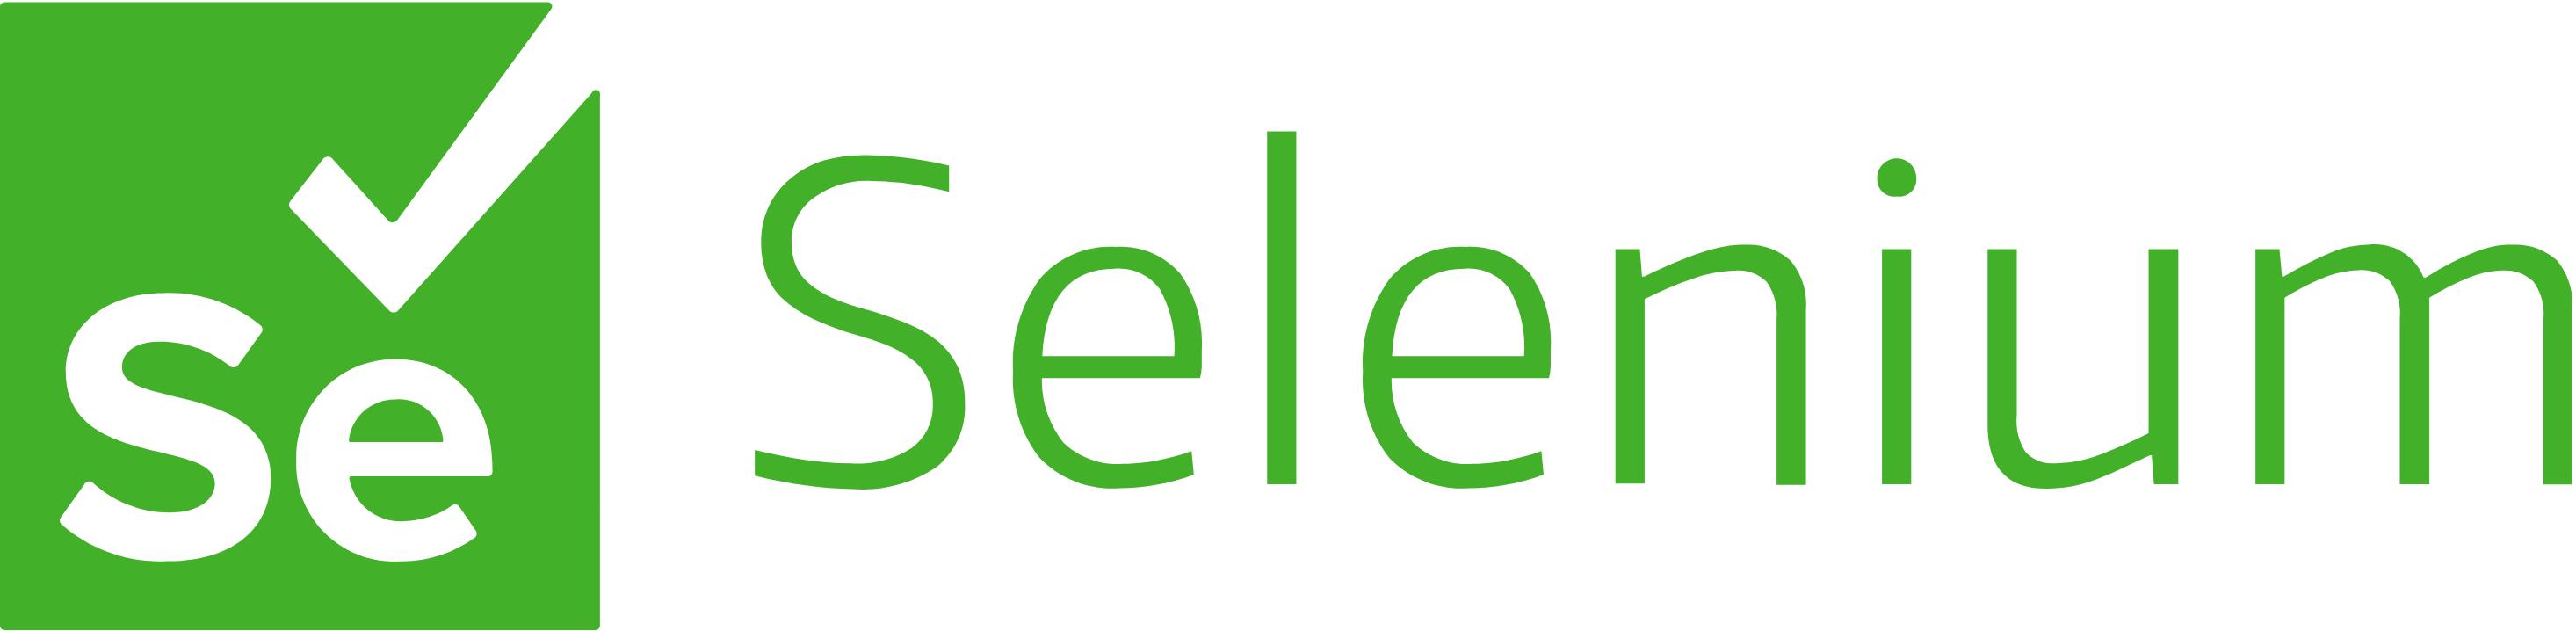 Devops automated testing tools – Selenium